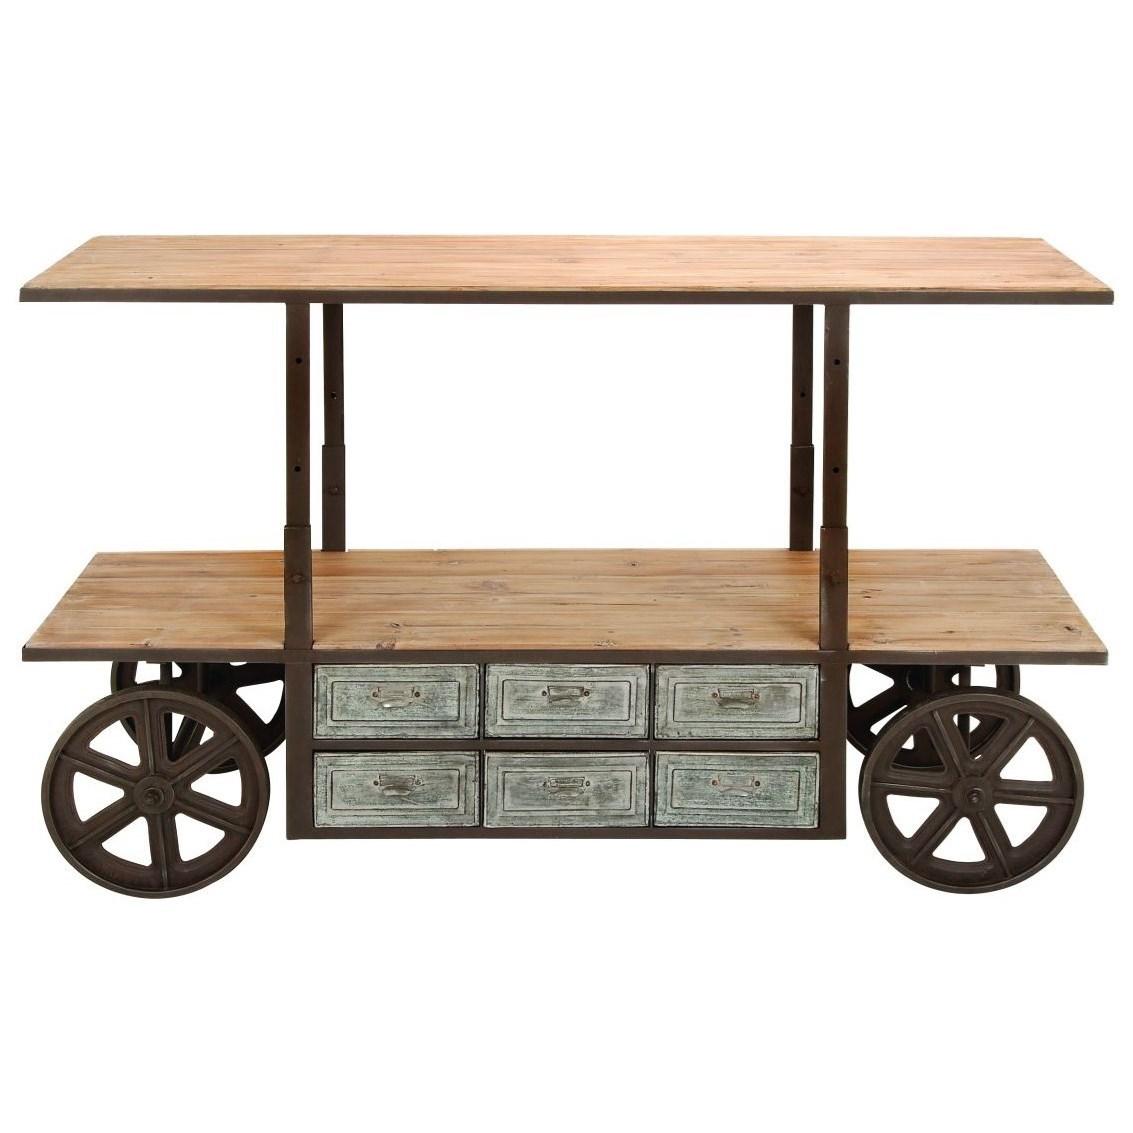 Accent Furniture Metal/Wood Adjustable Media Cart by UMA Enterprises, Inc. at Wilcox Furniture